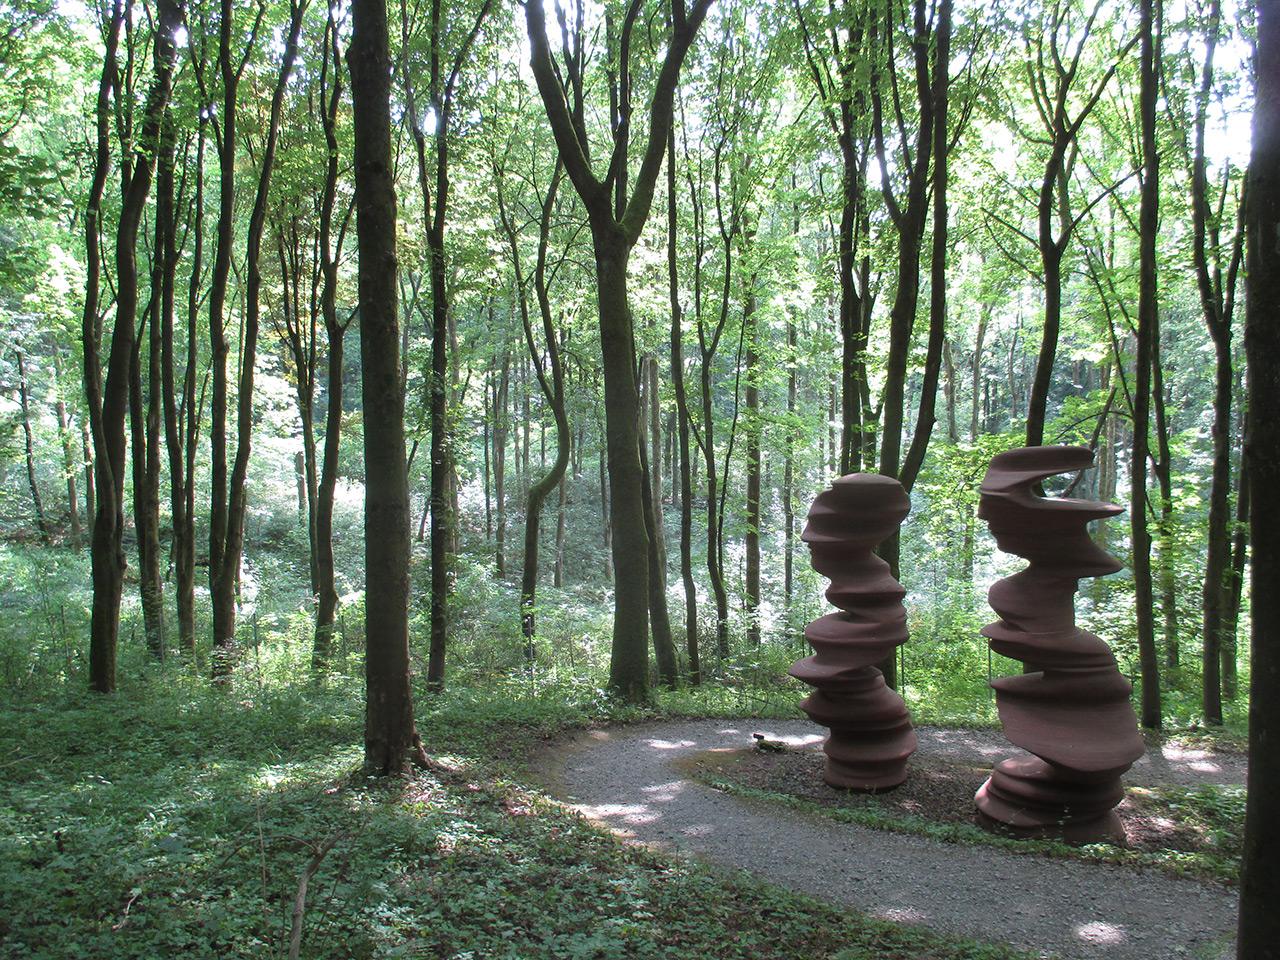 Tony Cragg, Here Today Gone Tomorrow 2002, Skulpturenpark Waldfrieden